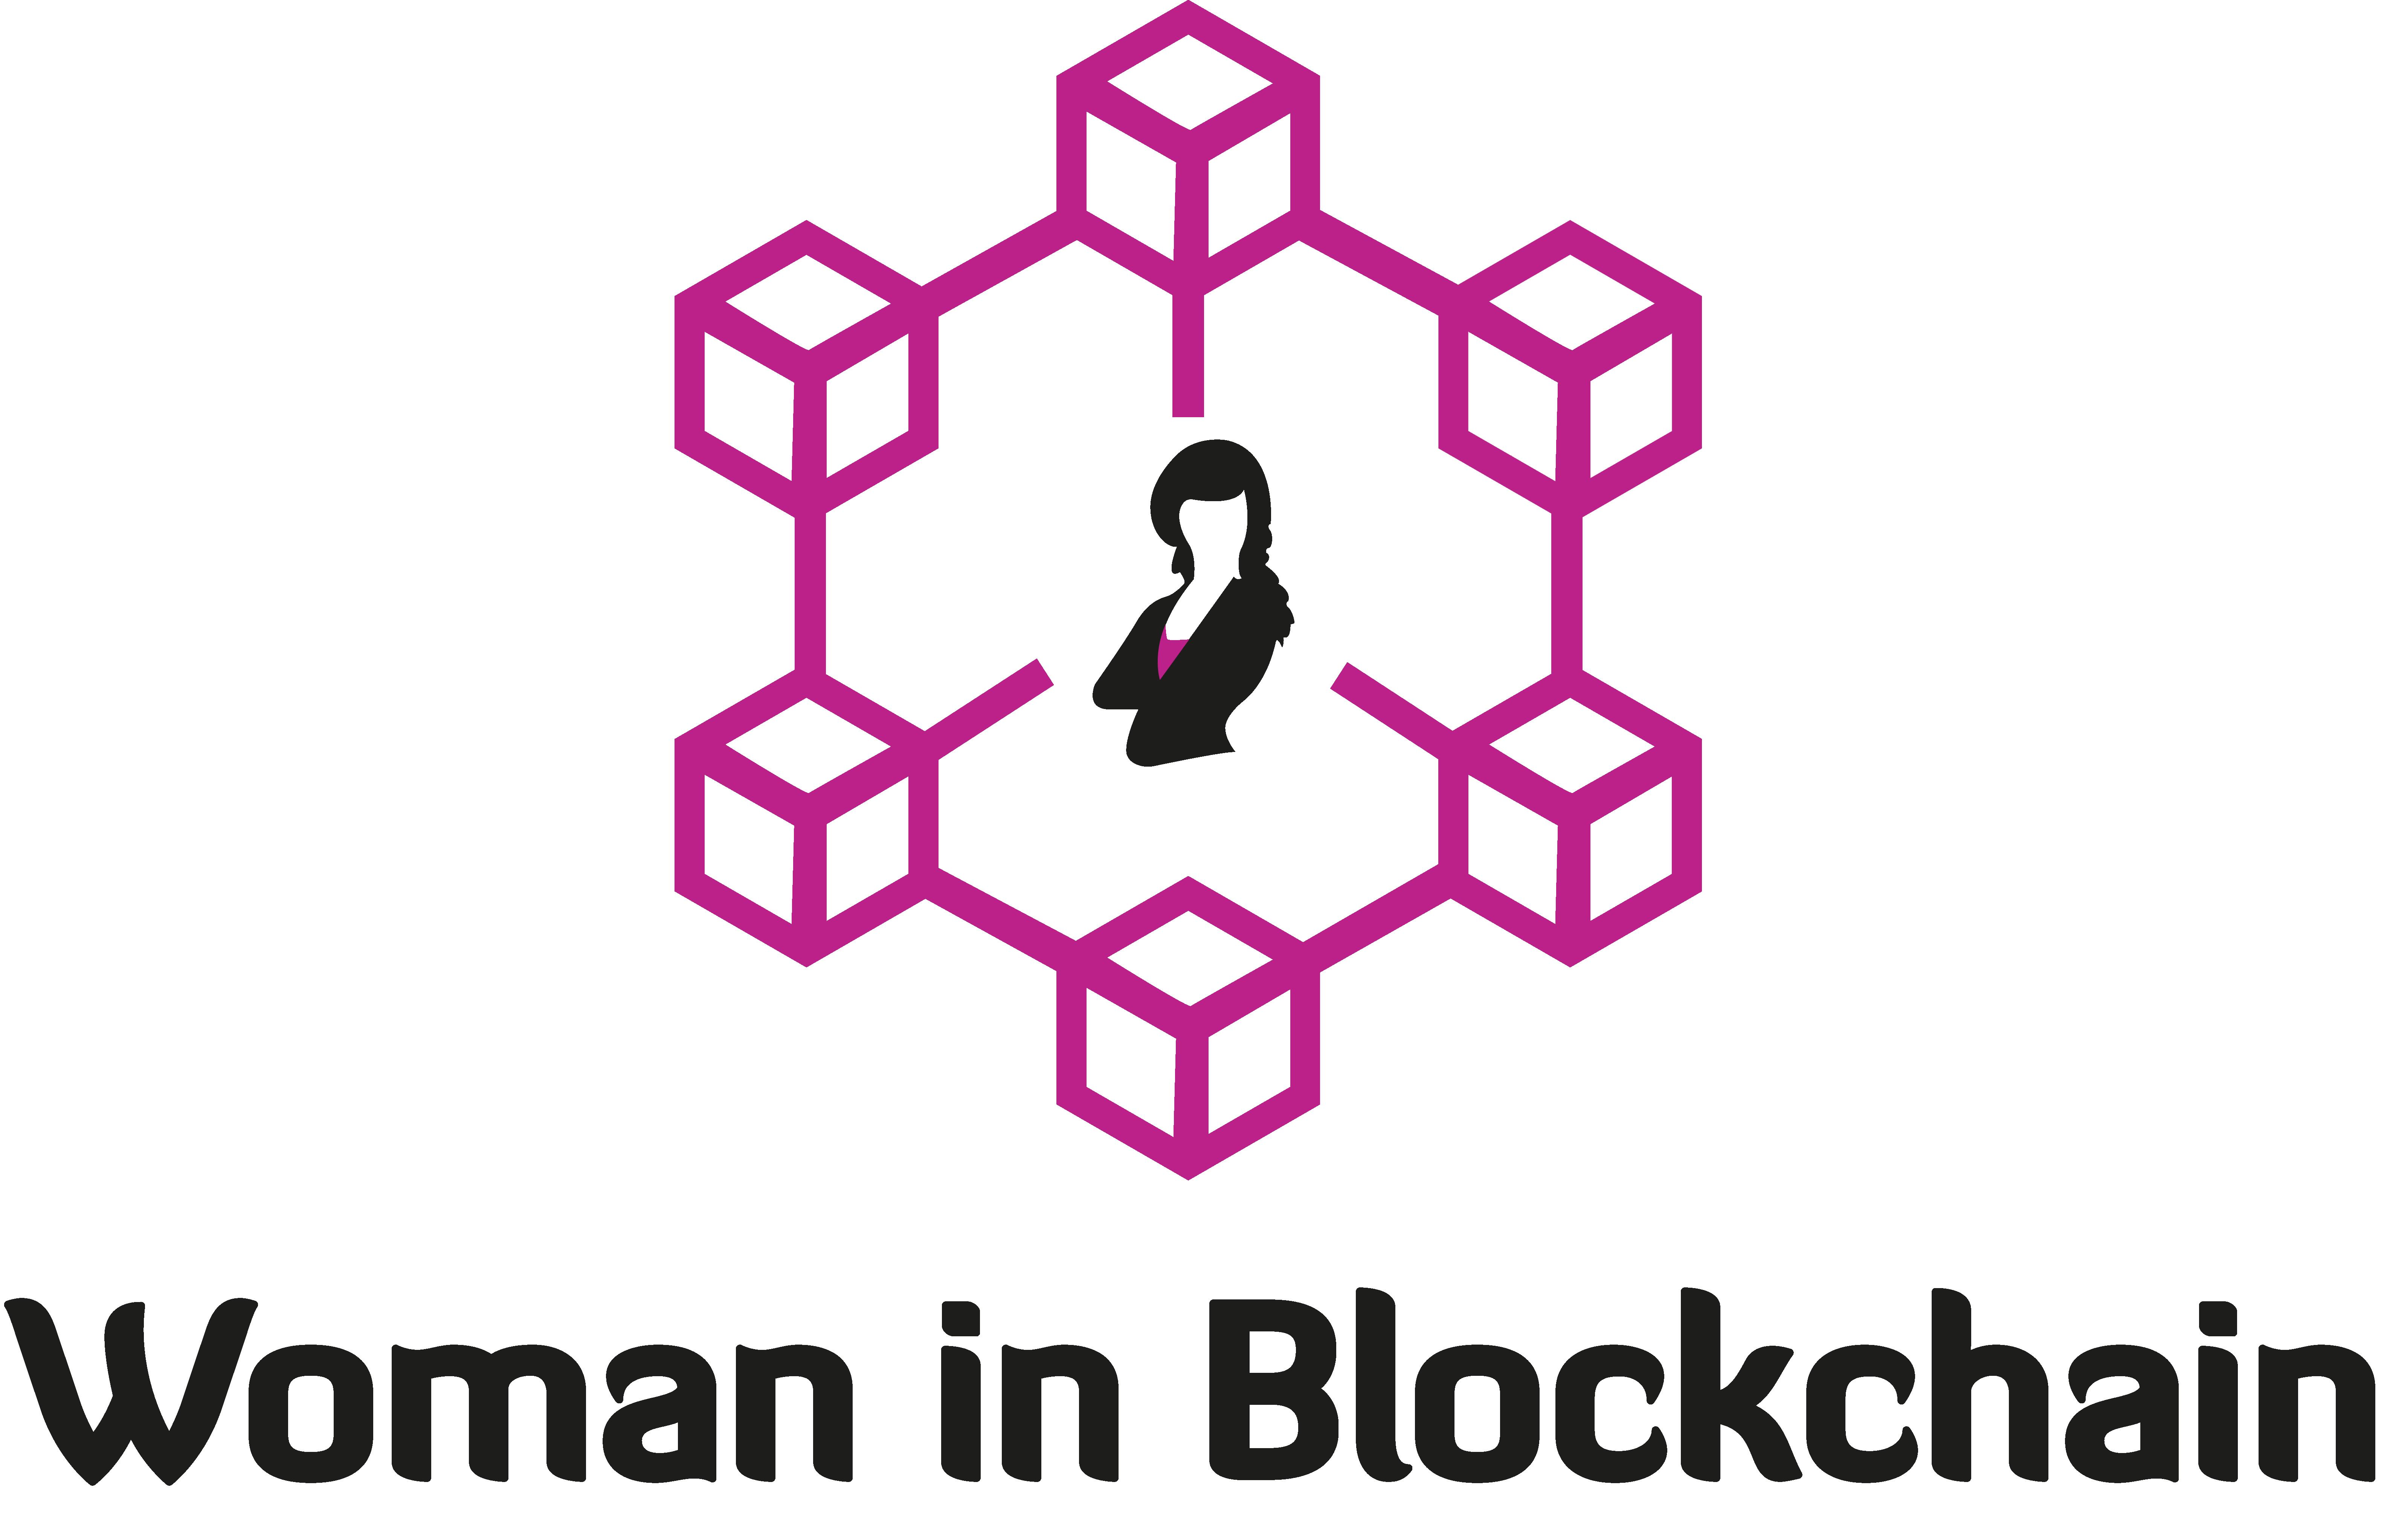 Women in Blockchain London Networking Event